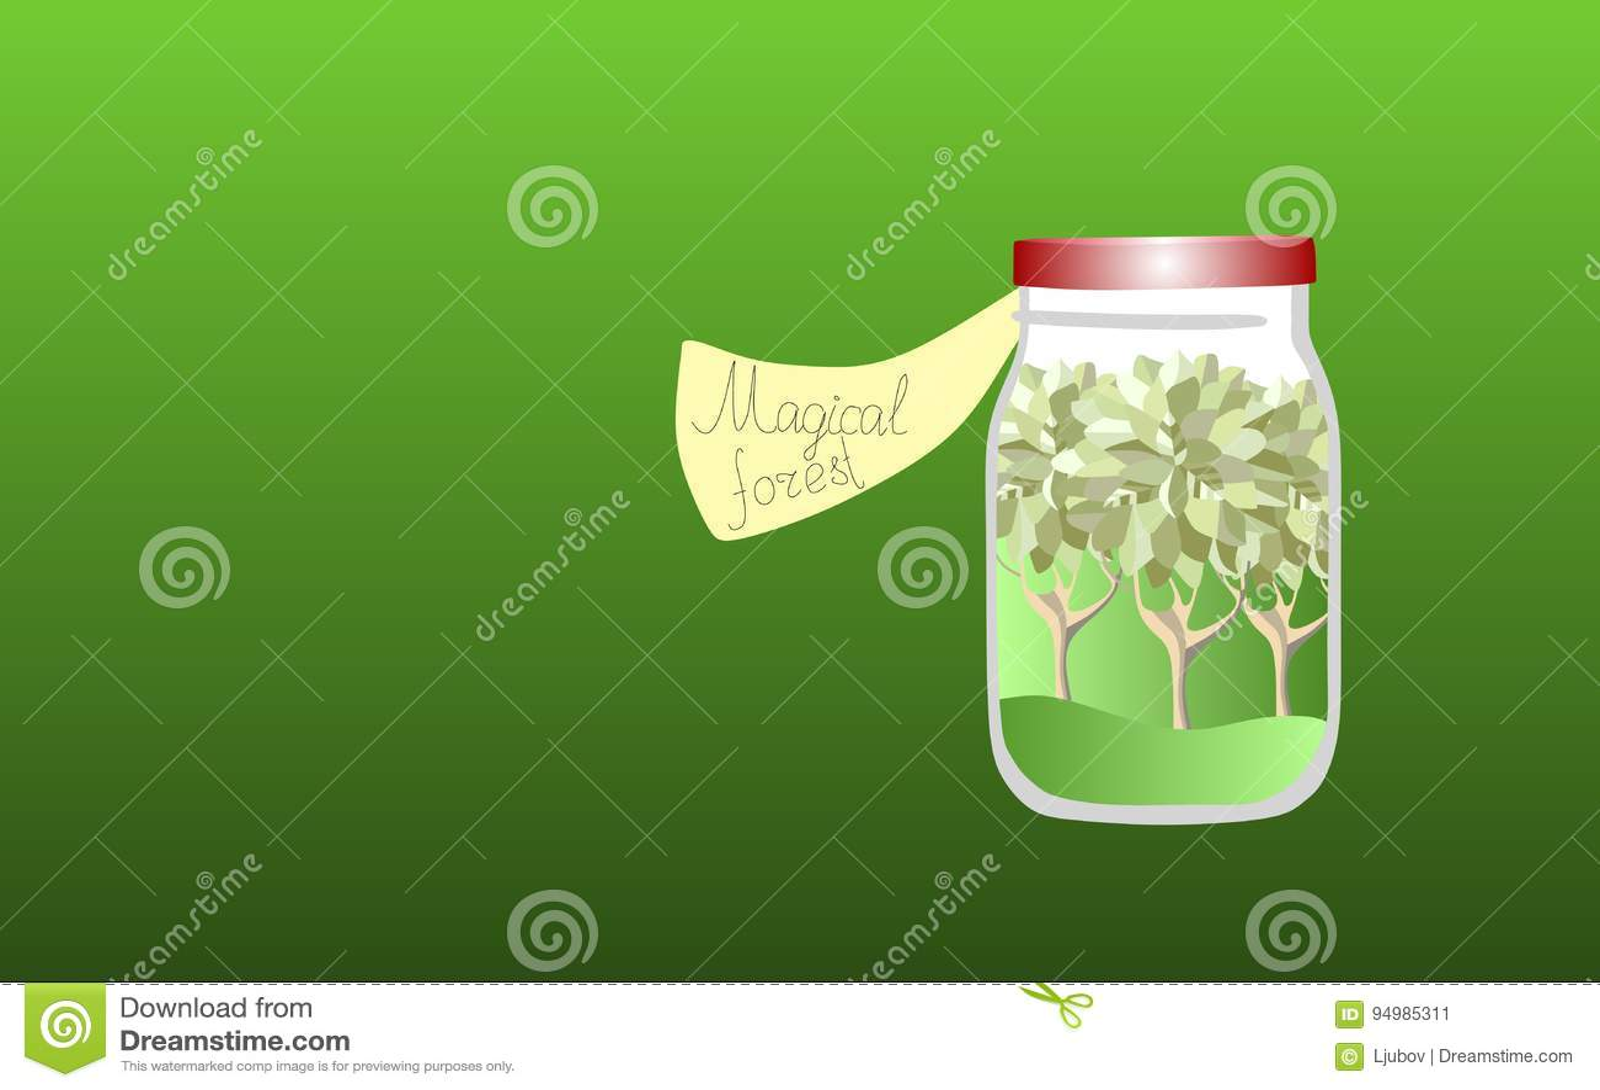 Vitamins for the Soul 3. Allegorical illustration. Medicine for the soul. Magic forest